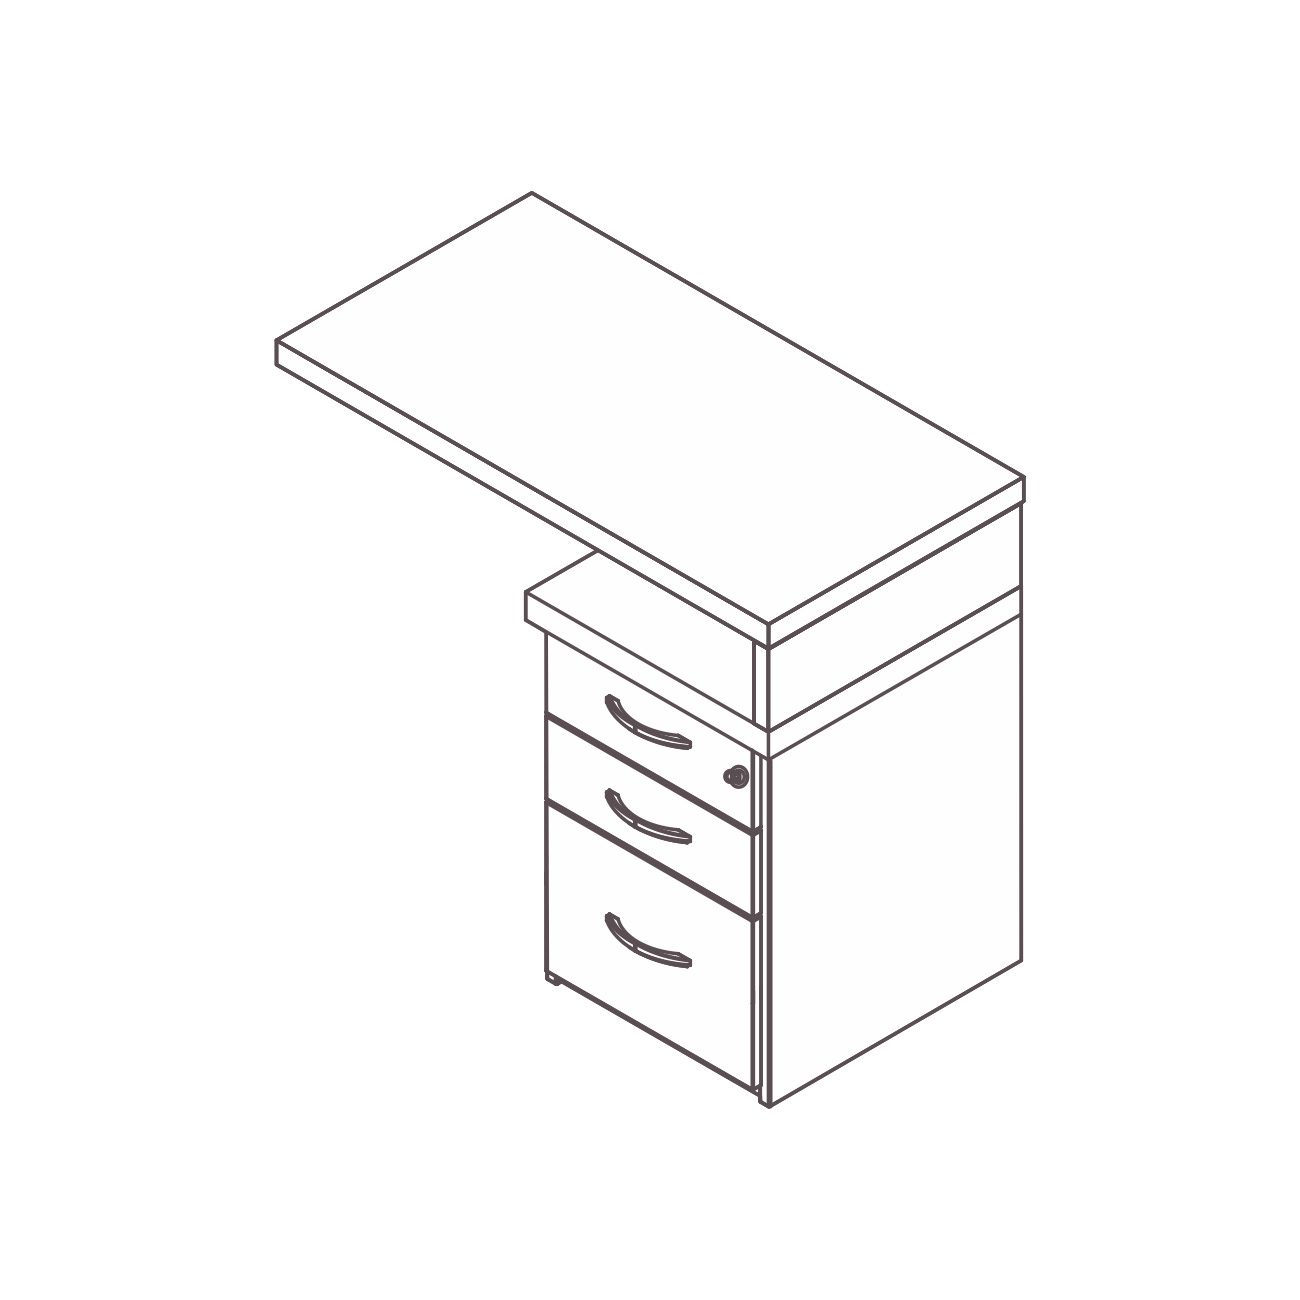 Mesa apoio gaveteiro 2 gavetas/pasta suspensa safira / ap30